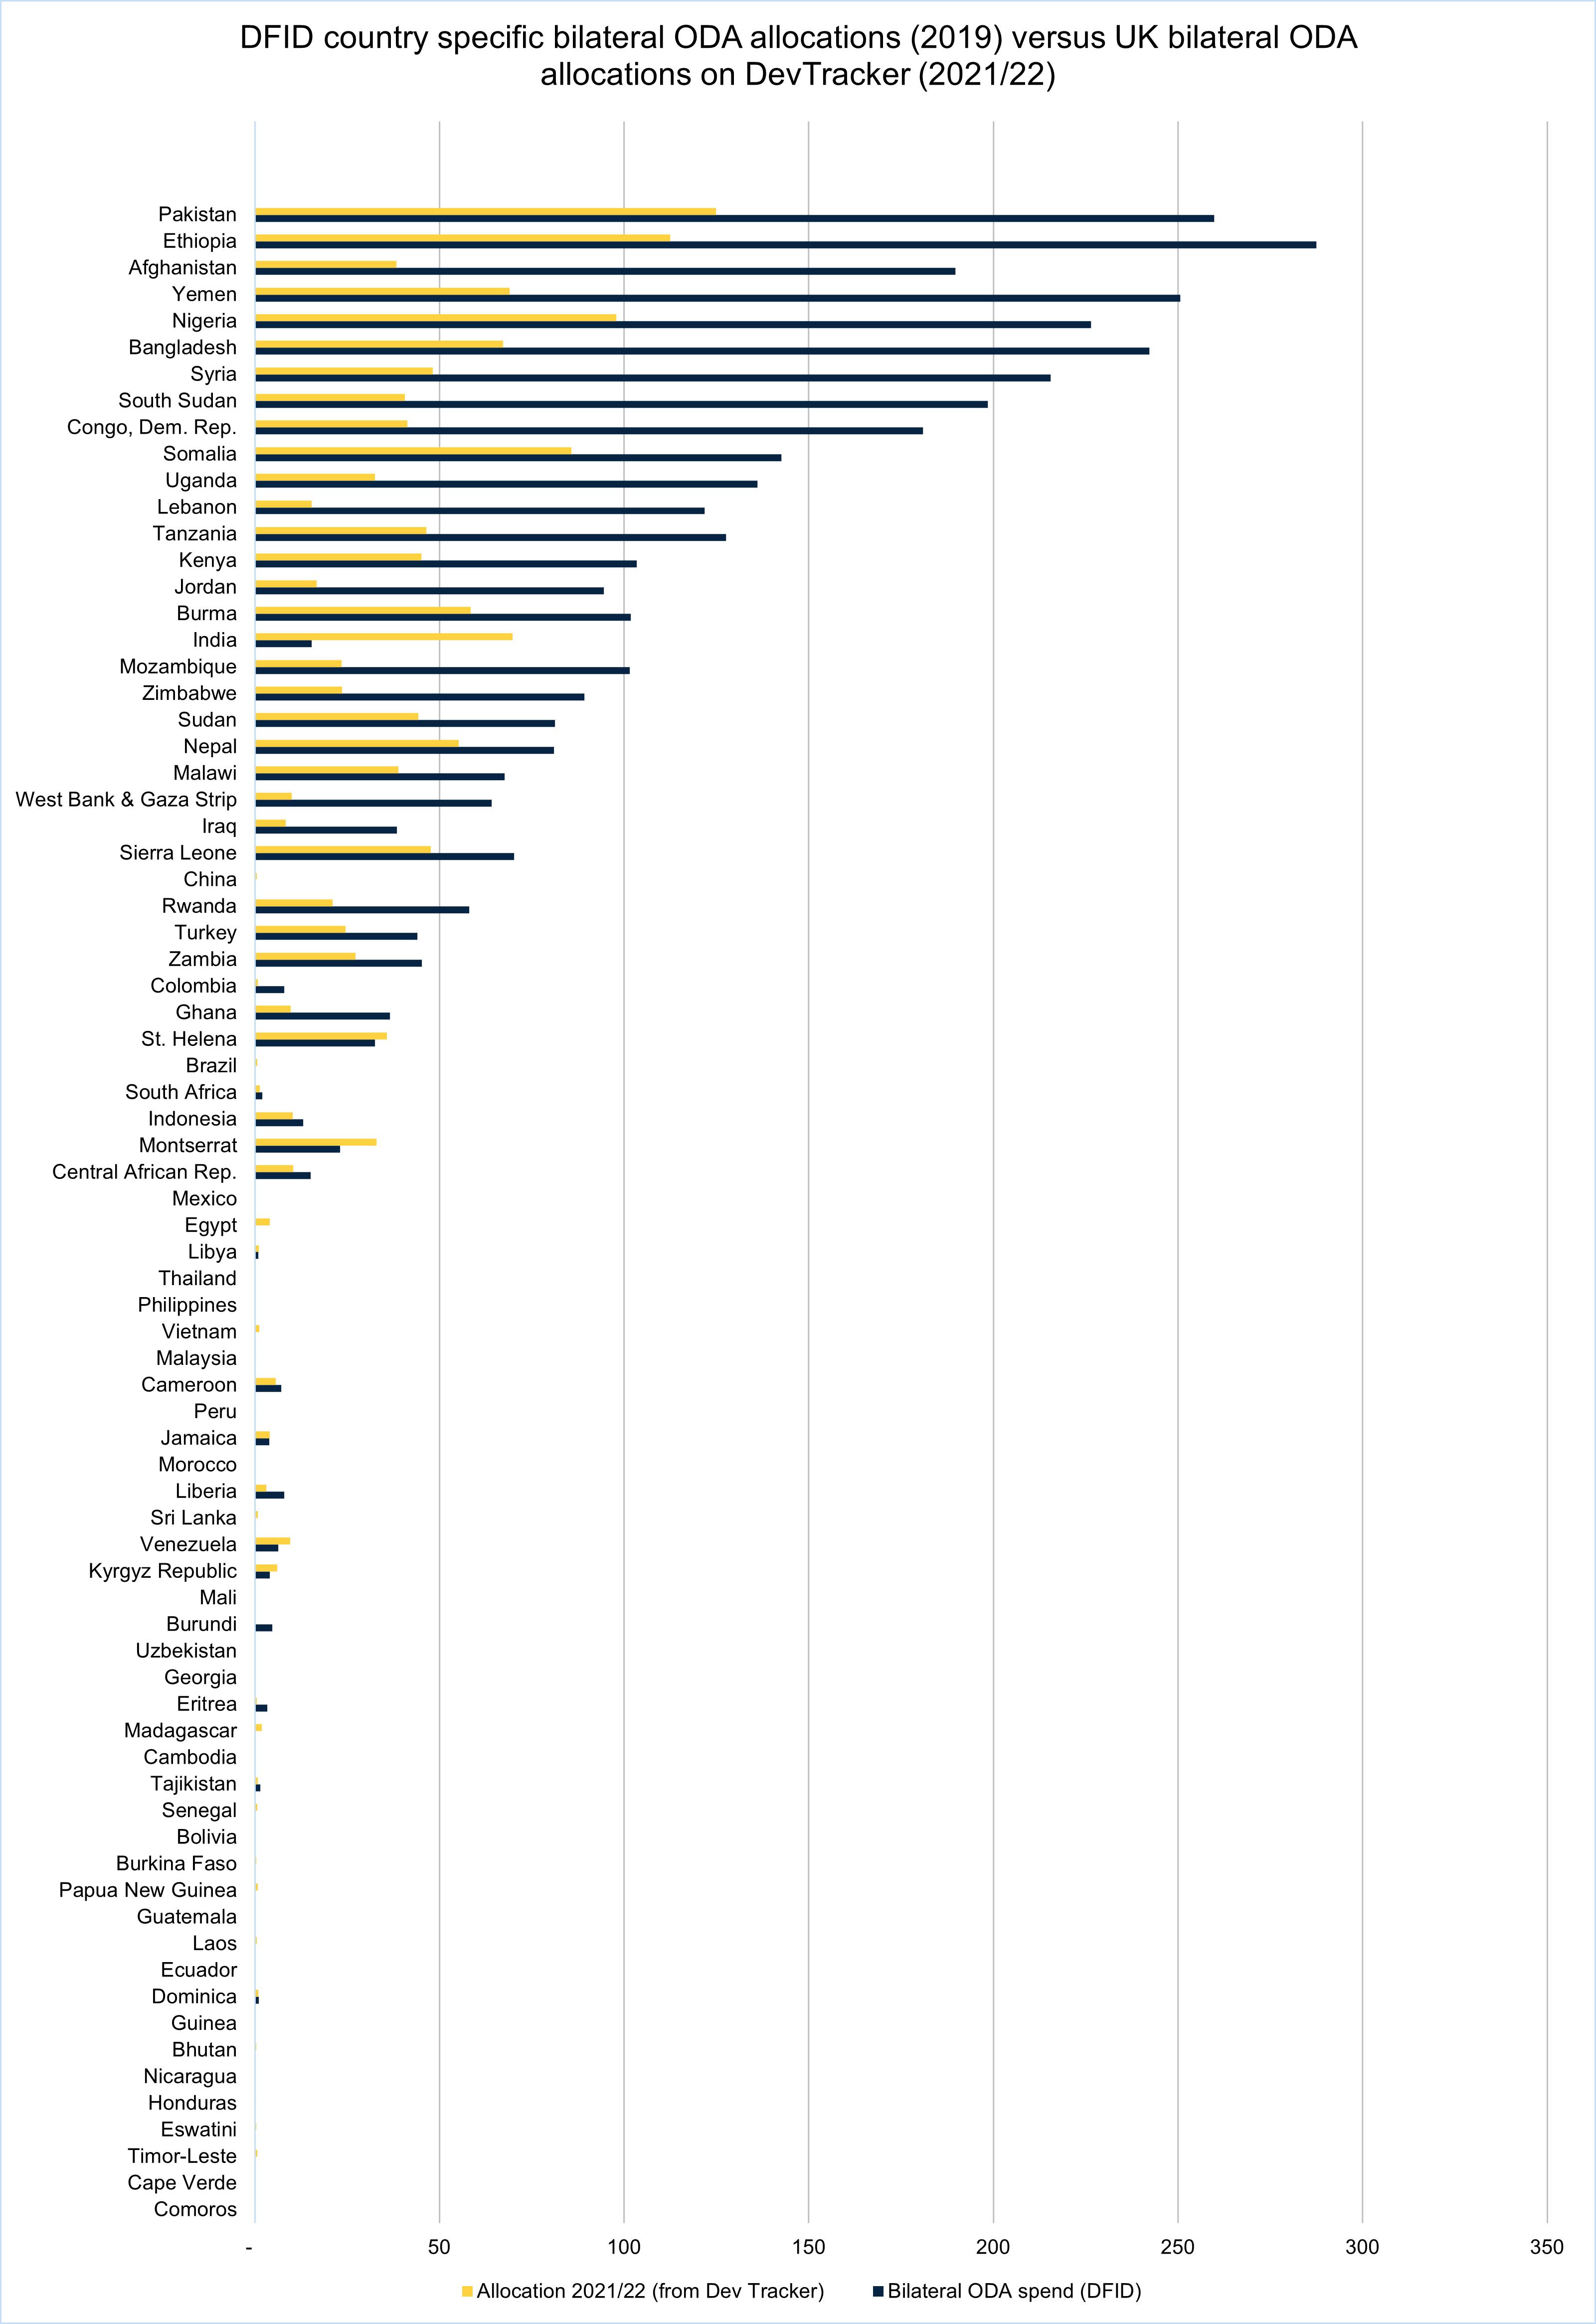 DFID-country-specific-bilateral-ODA-allocations-versus-UK-bilateral-ODA-allocations-on-DevTracker.jpg